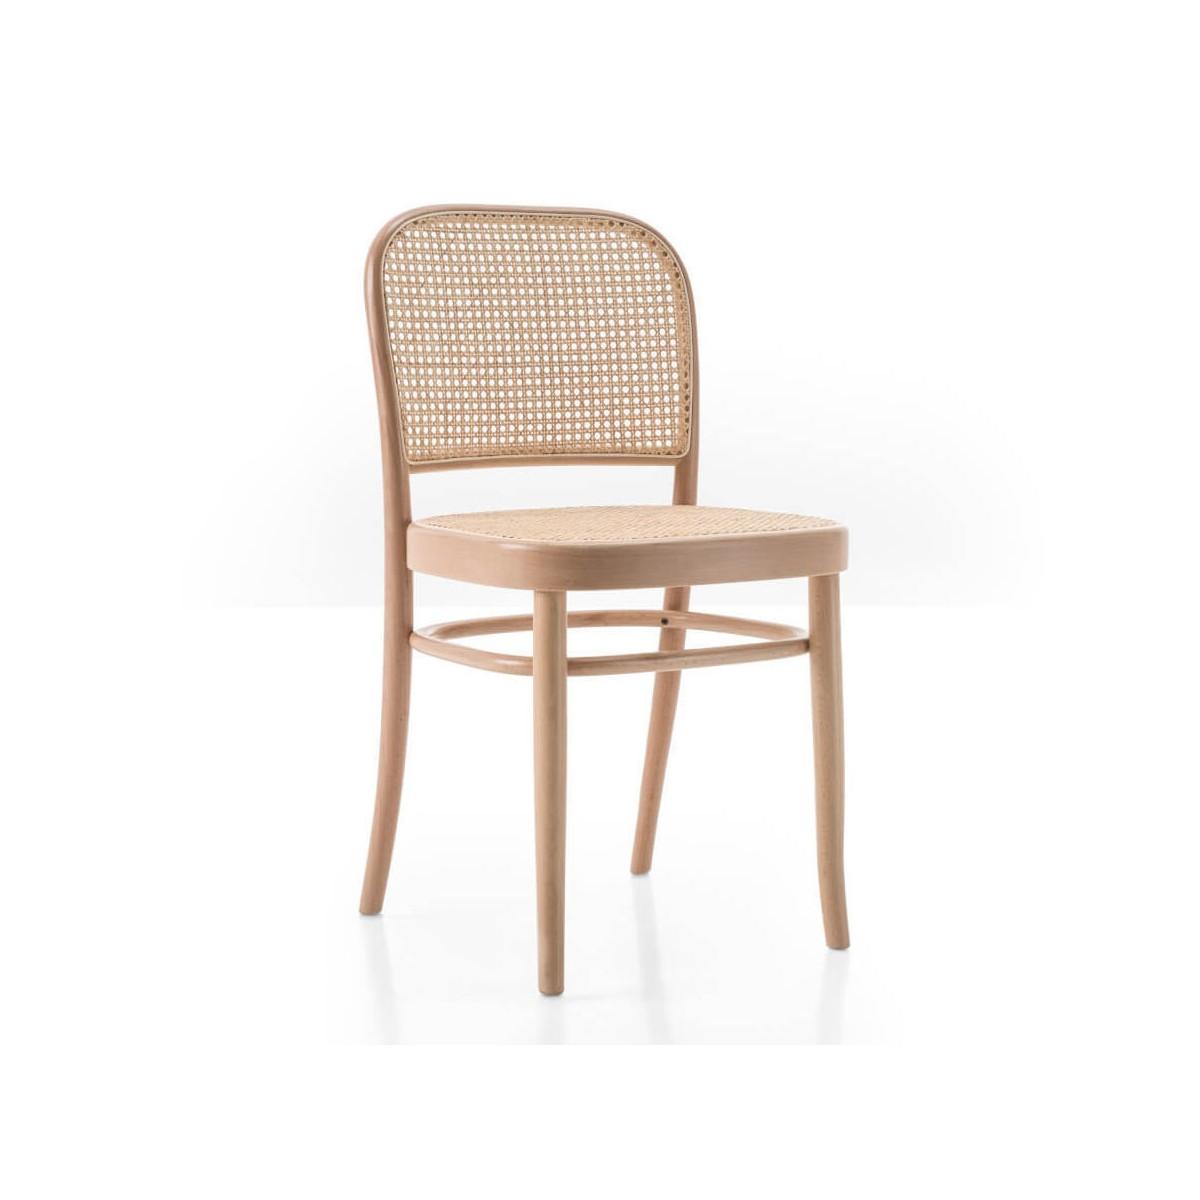 Chaise N.7 assise/dossier en paille - Wiener GTV Design